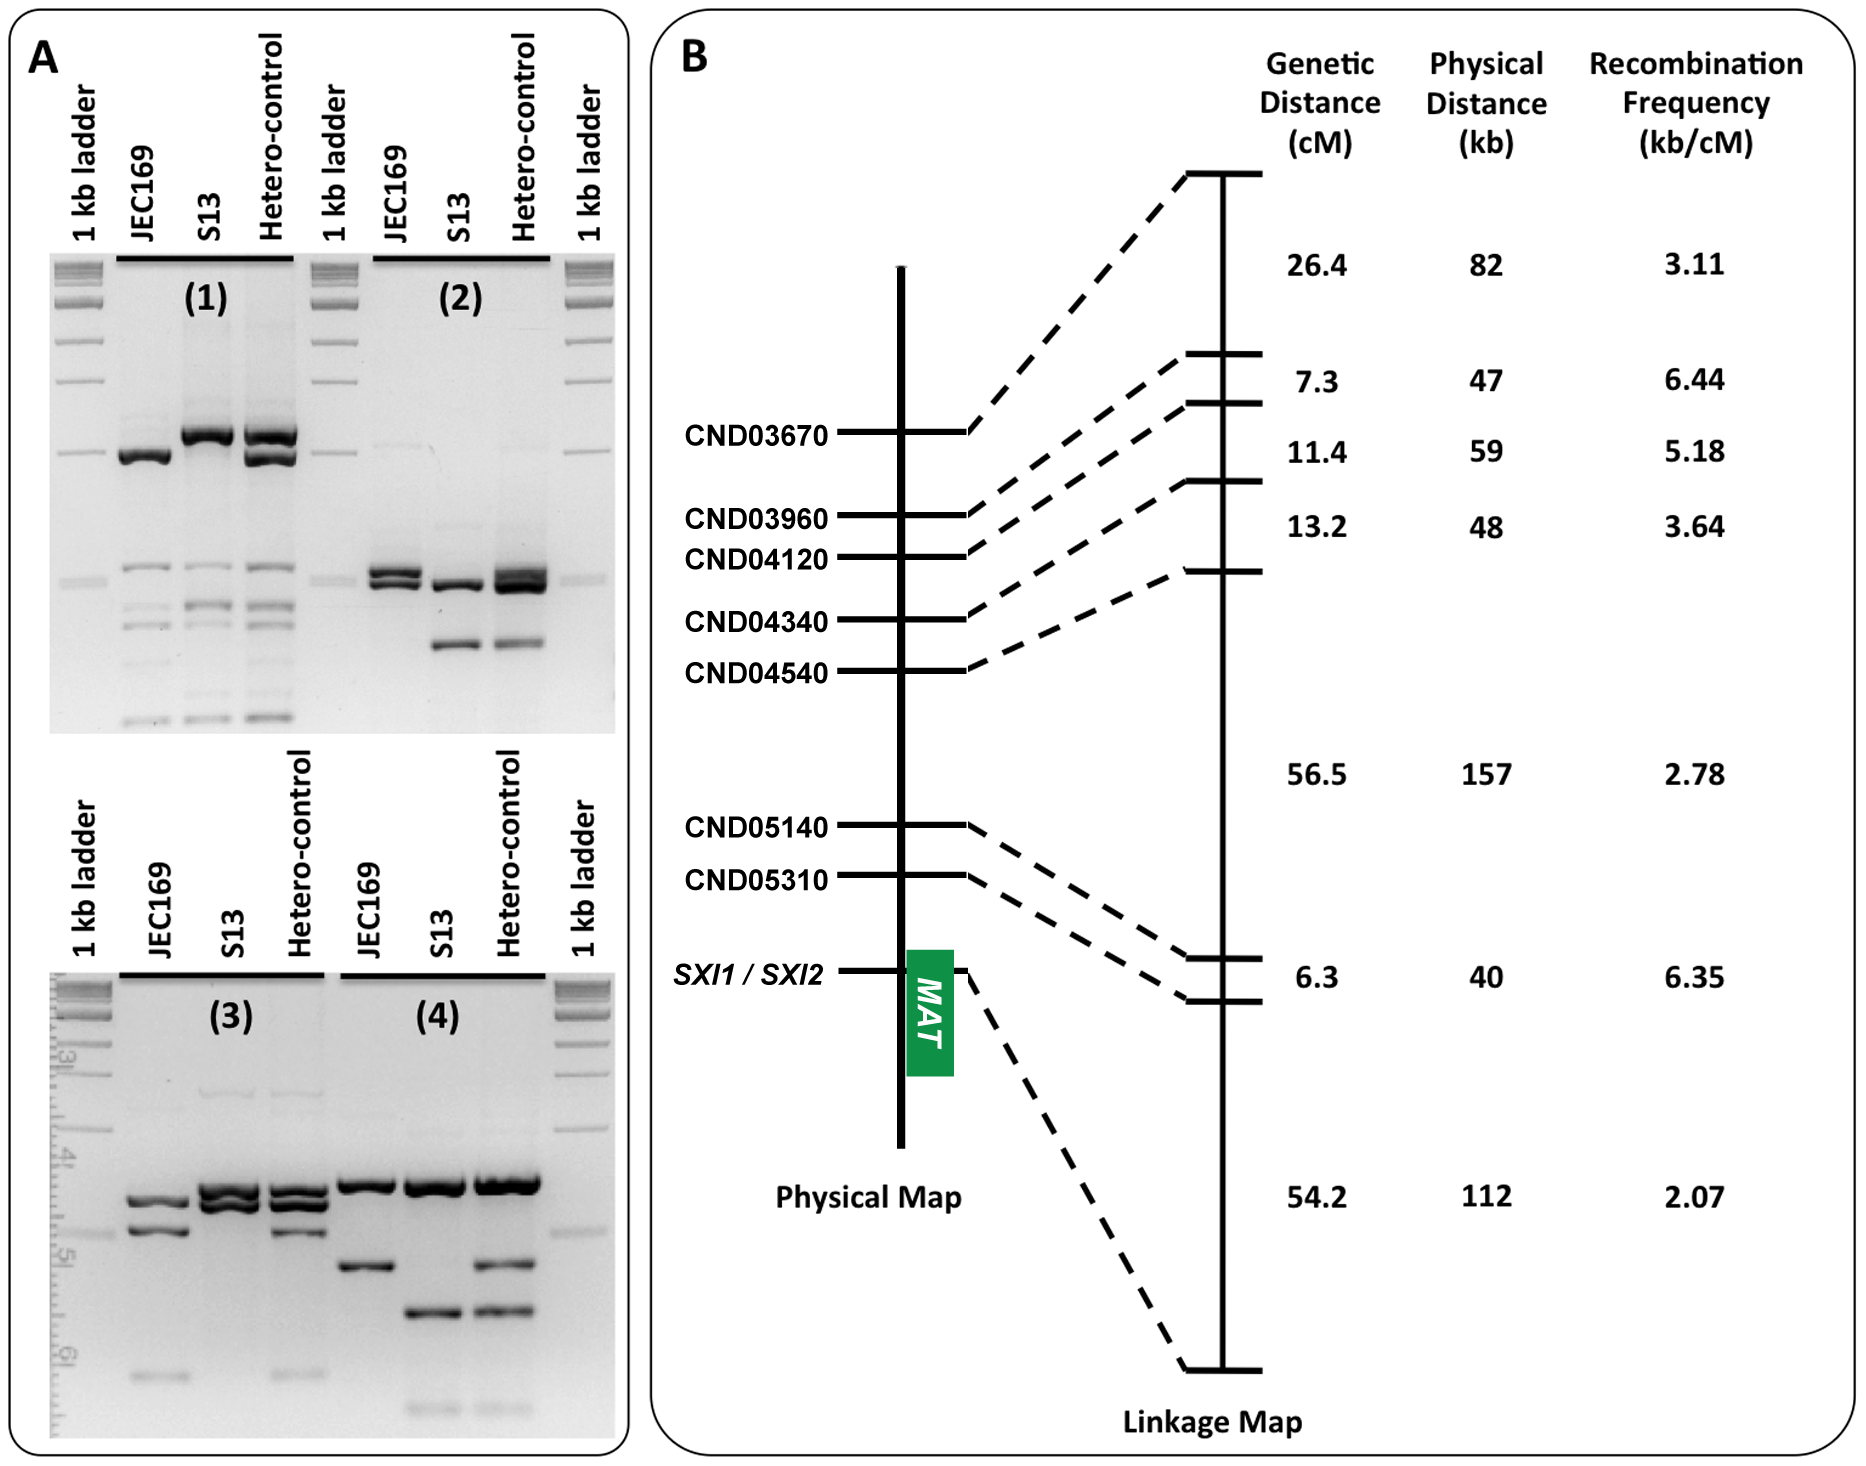 Meiotic recombination frequencies in chromosomal regions proximal to the <i>MAT</i> locus.